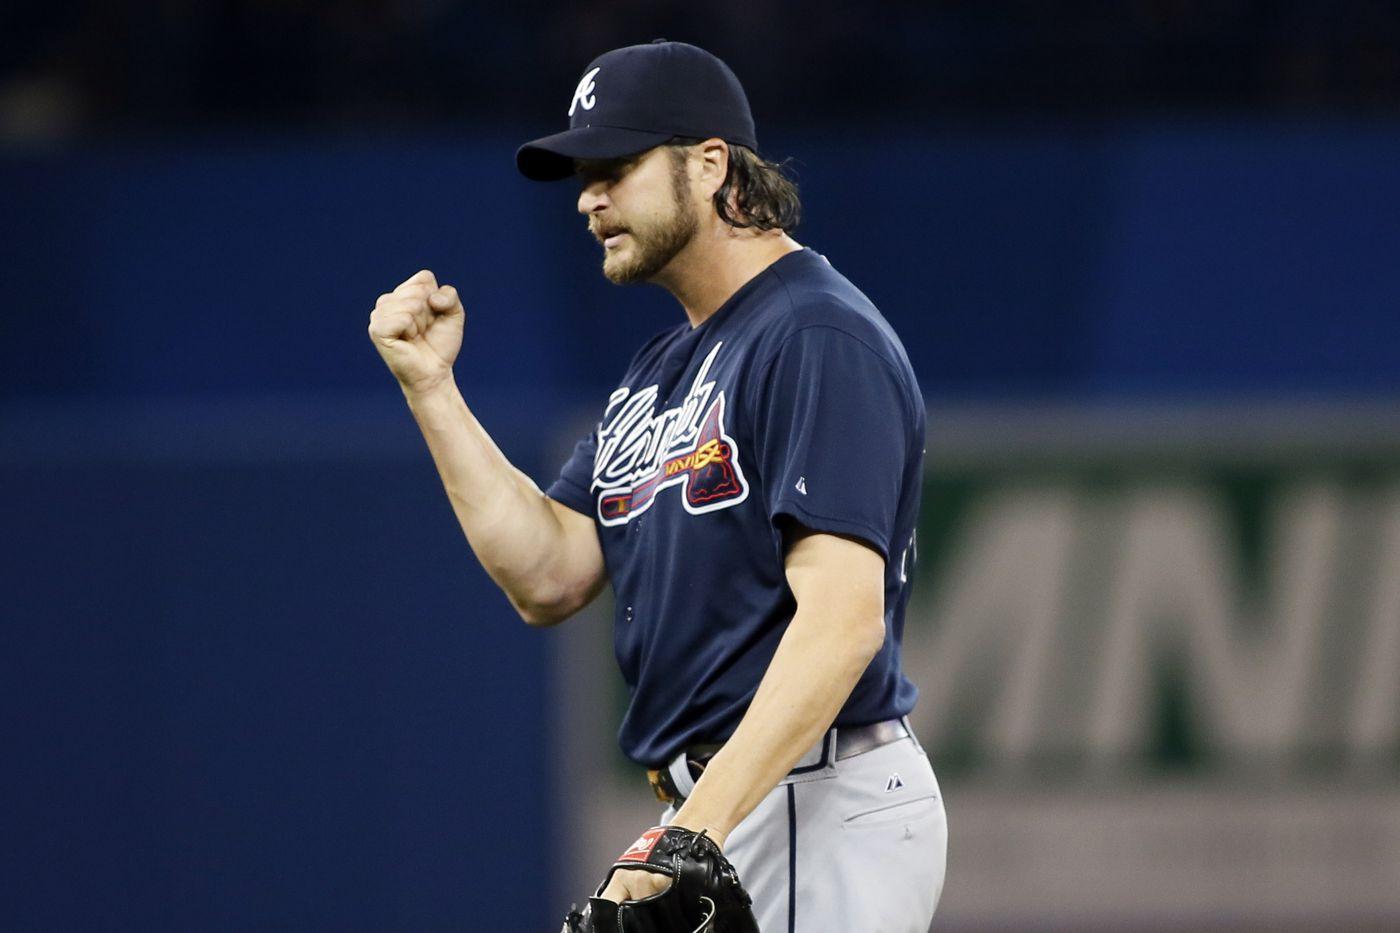 Blue Jays Hit Five Home Runs, Still Lose To Braves